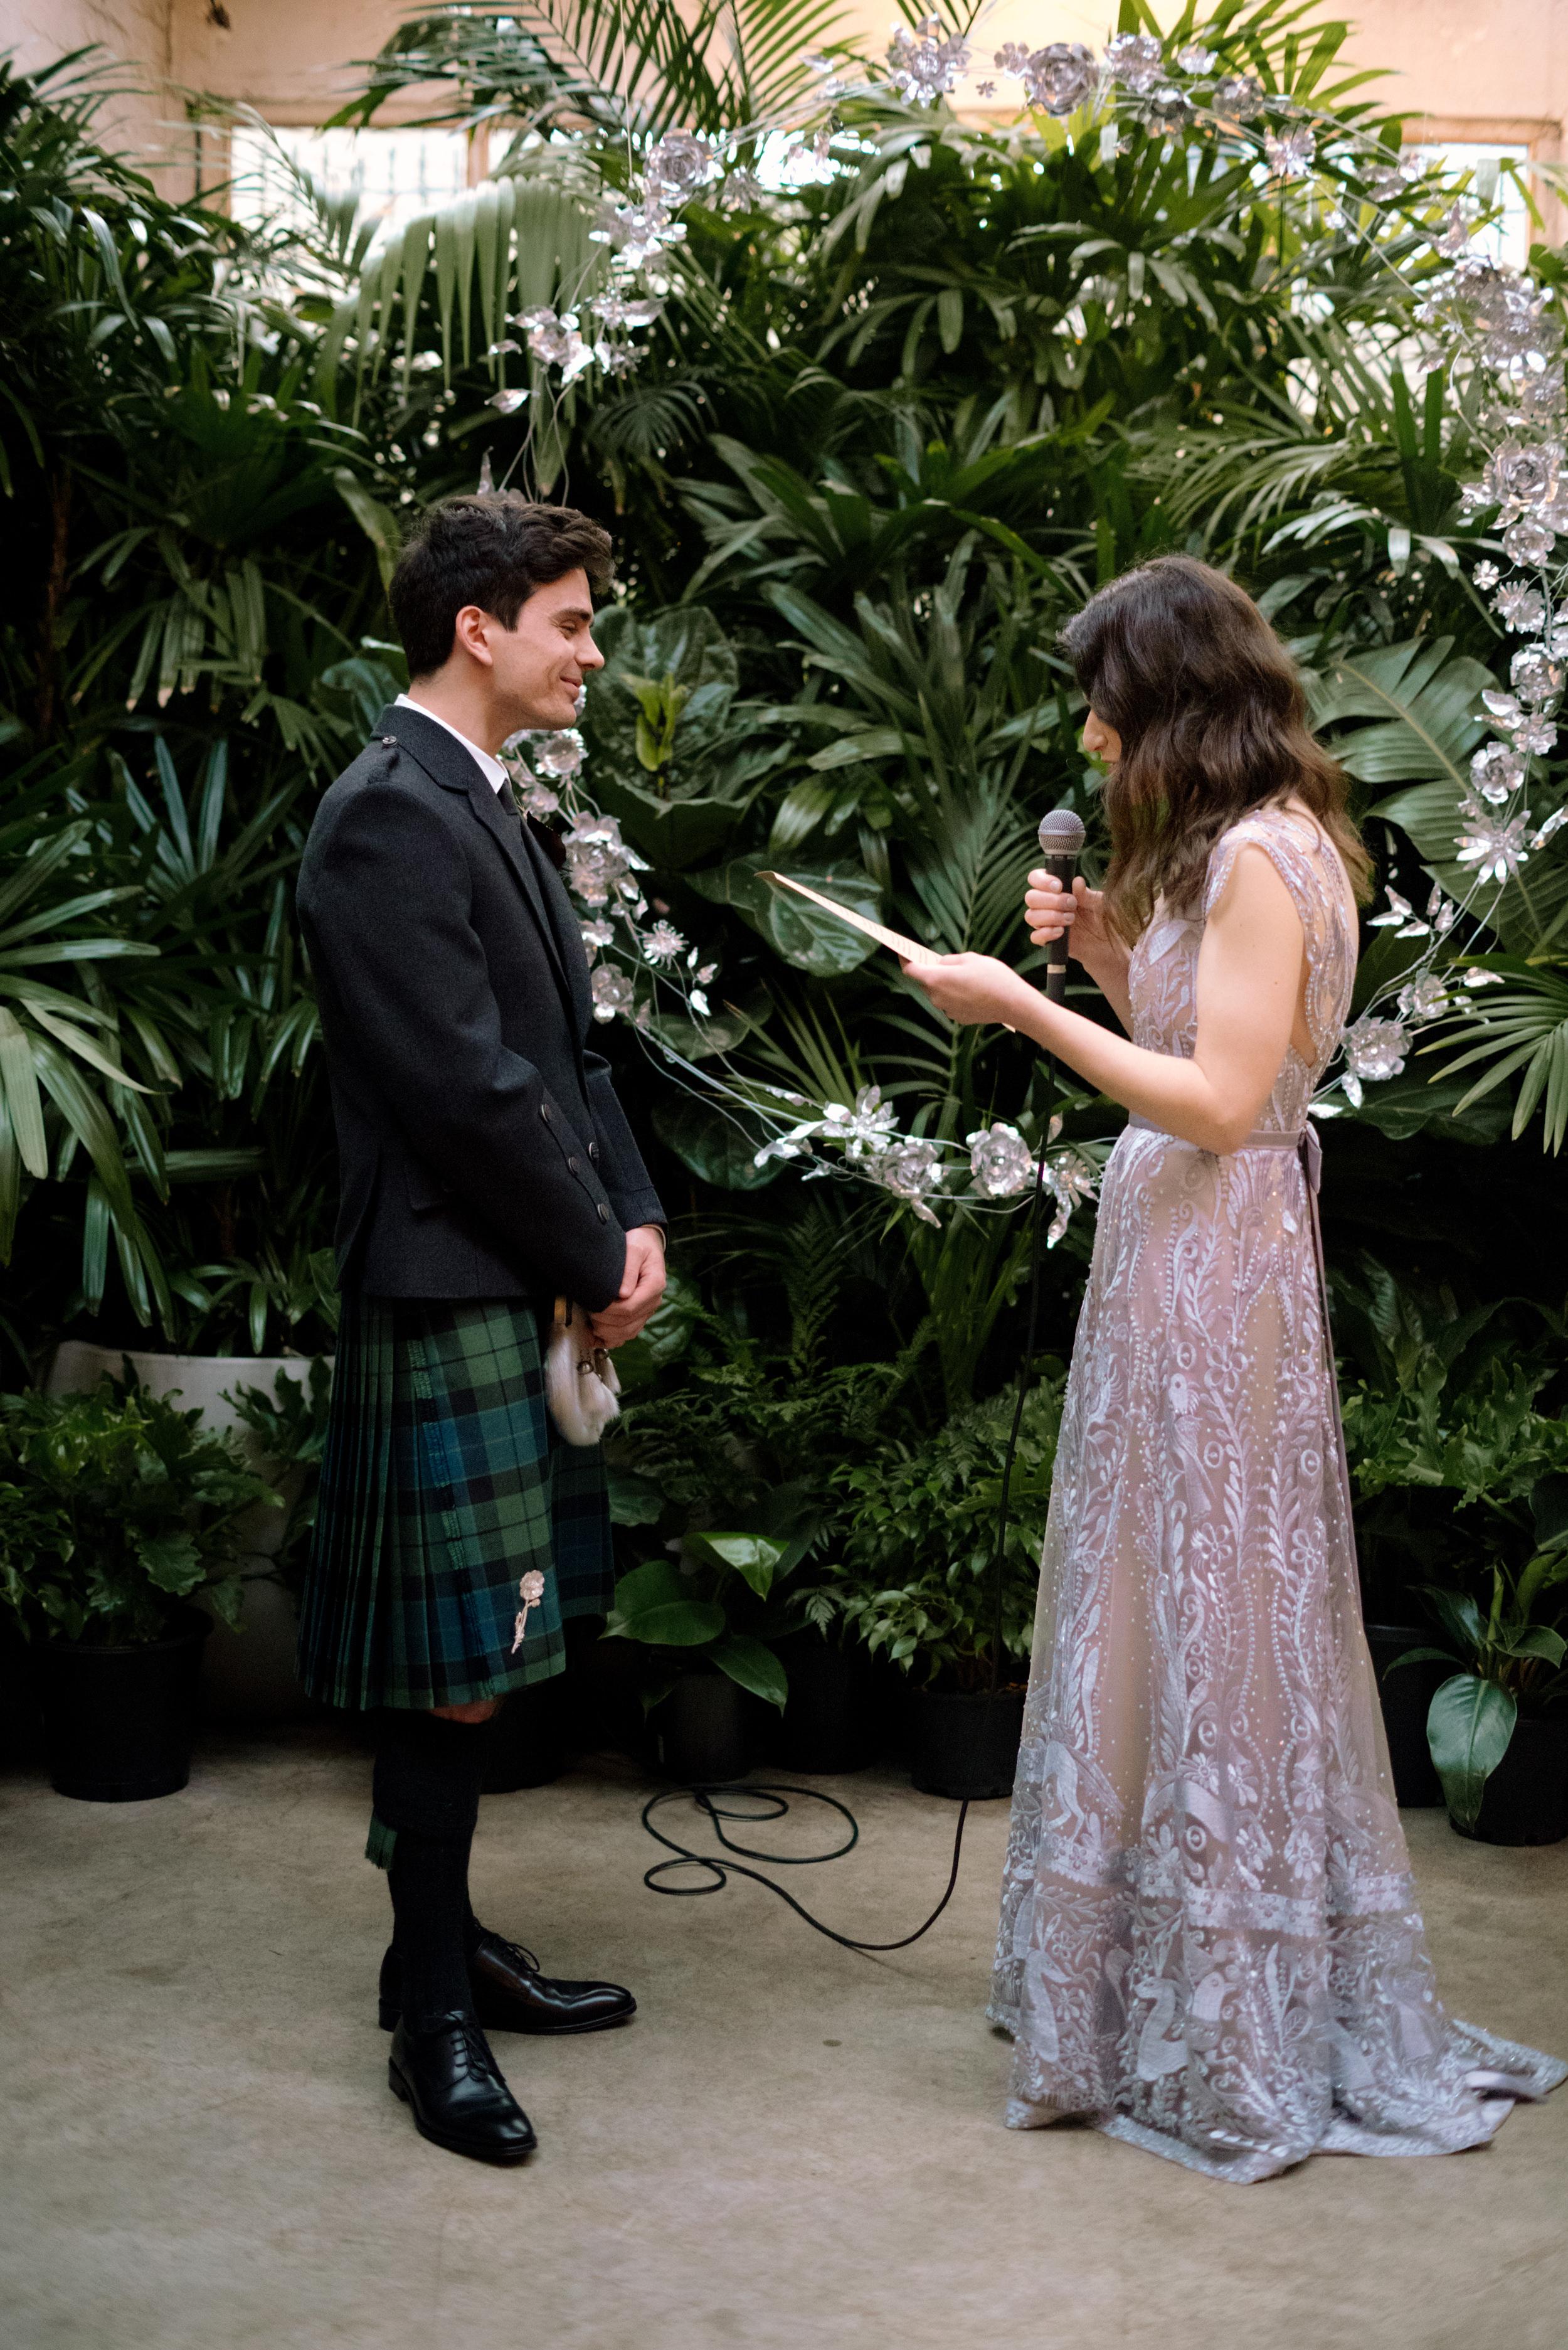 I-Got-You-Babe-&.Co.-Glasshaus-Wedding-Charlotte-Cameron0073.JPG